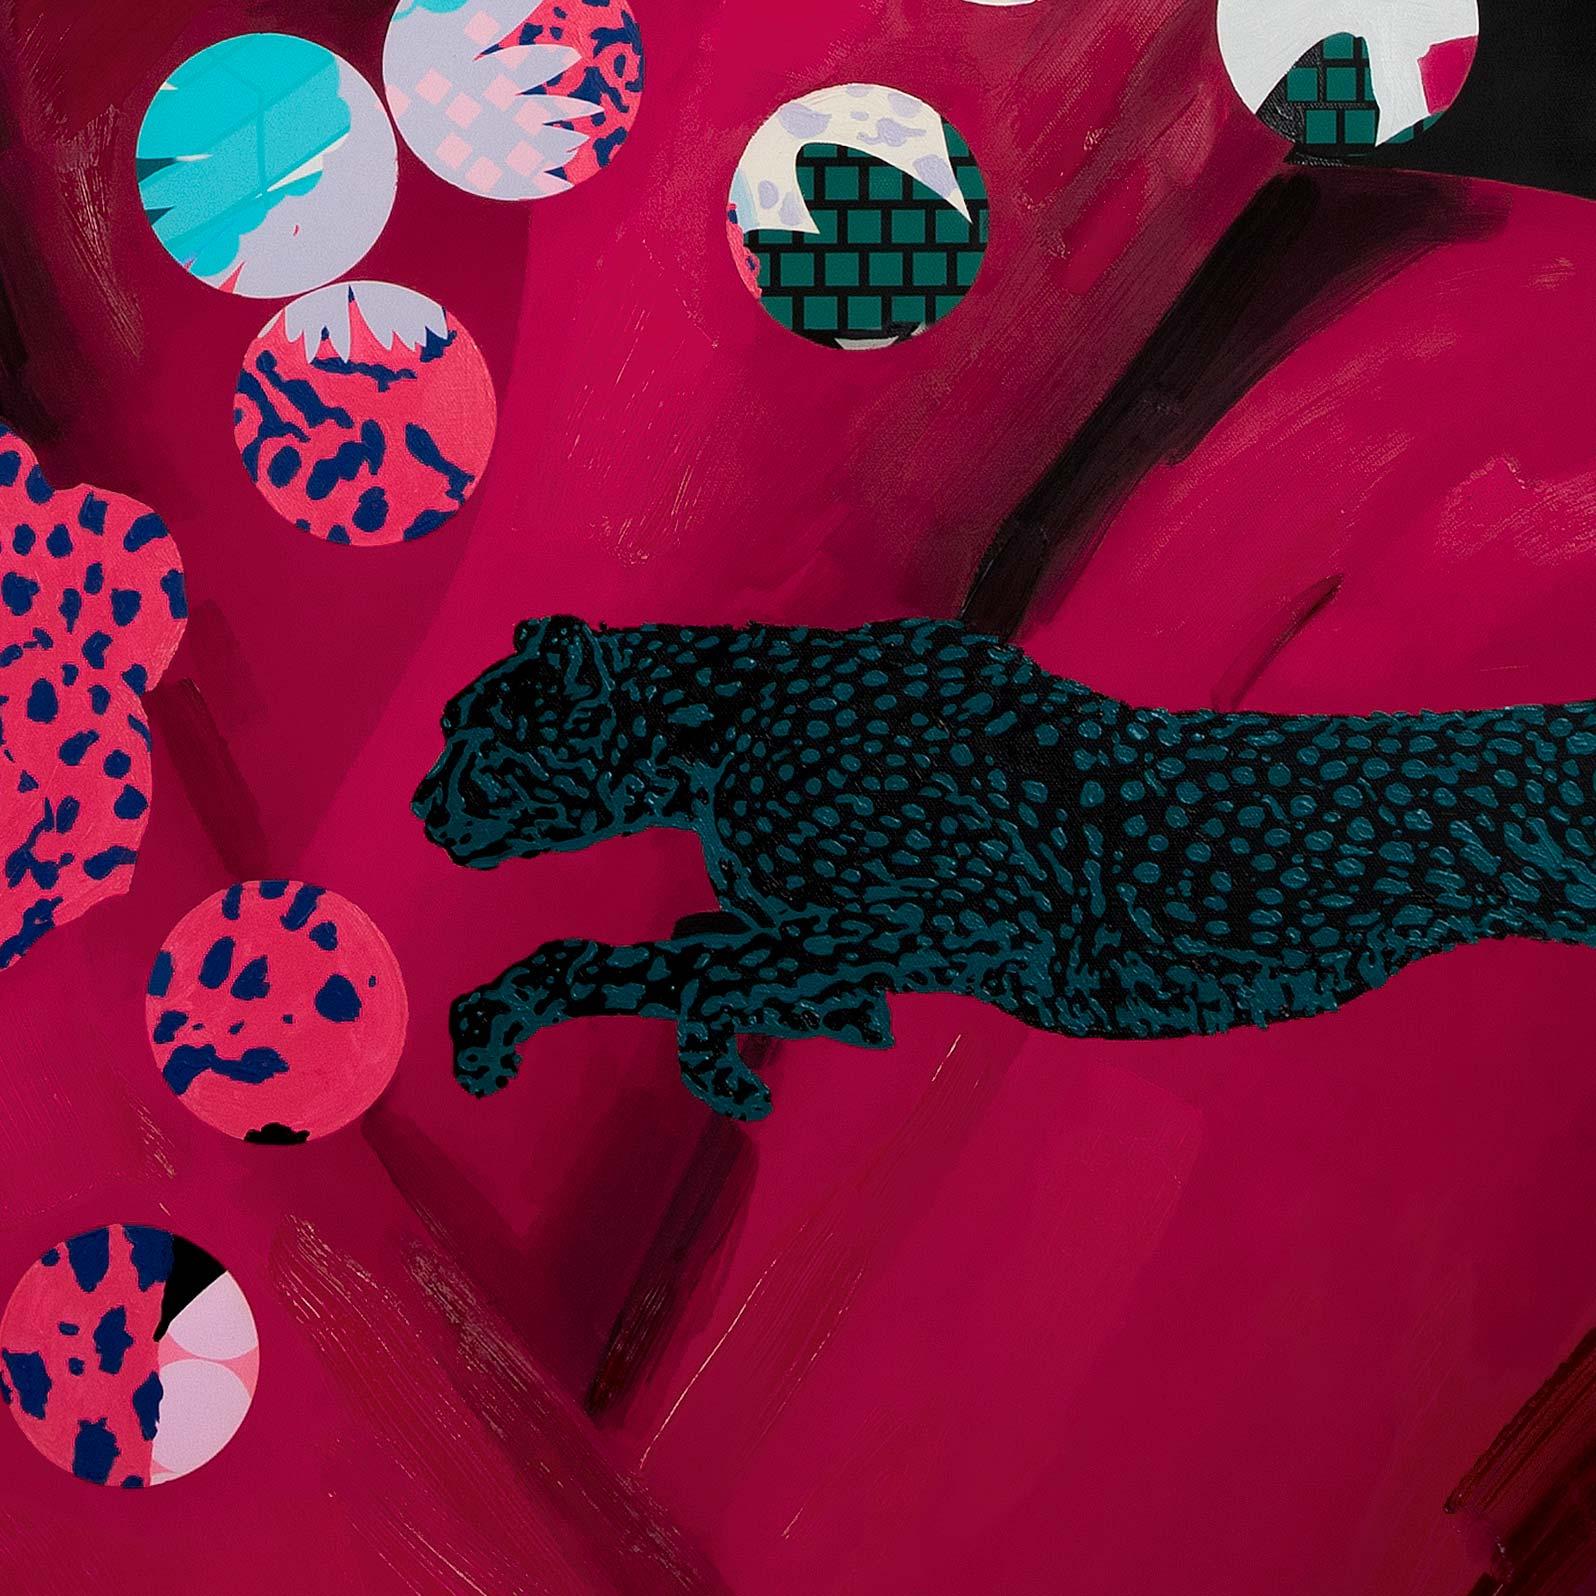 Anca Stefanescu | Modern Oil Painting Artists, PatternsOfPerception